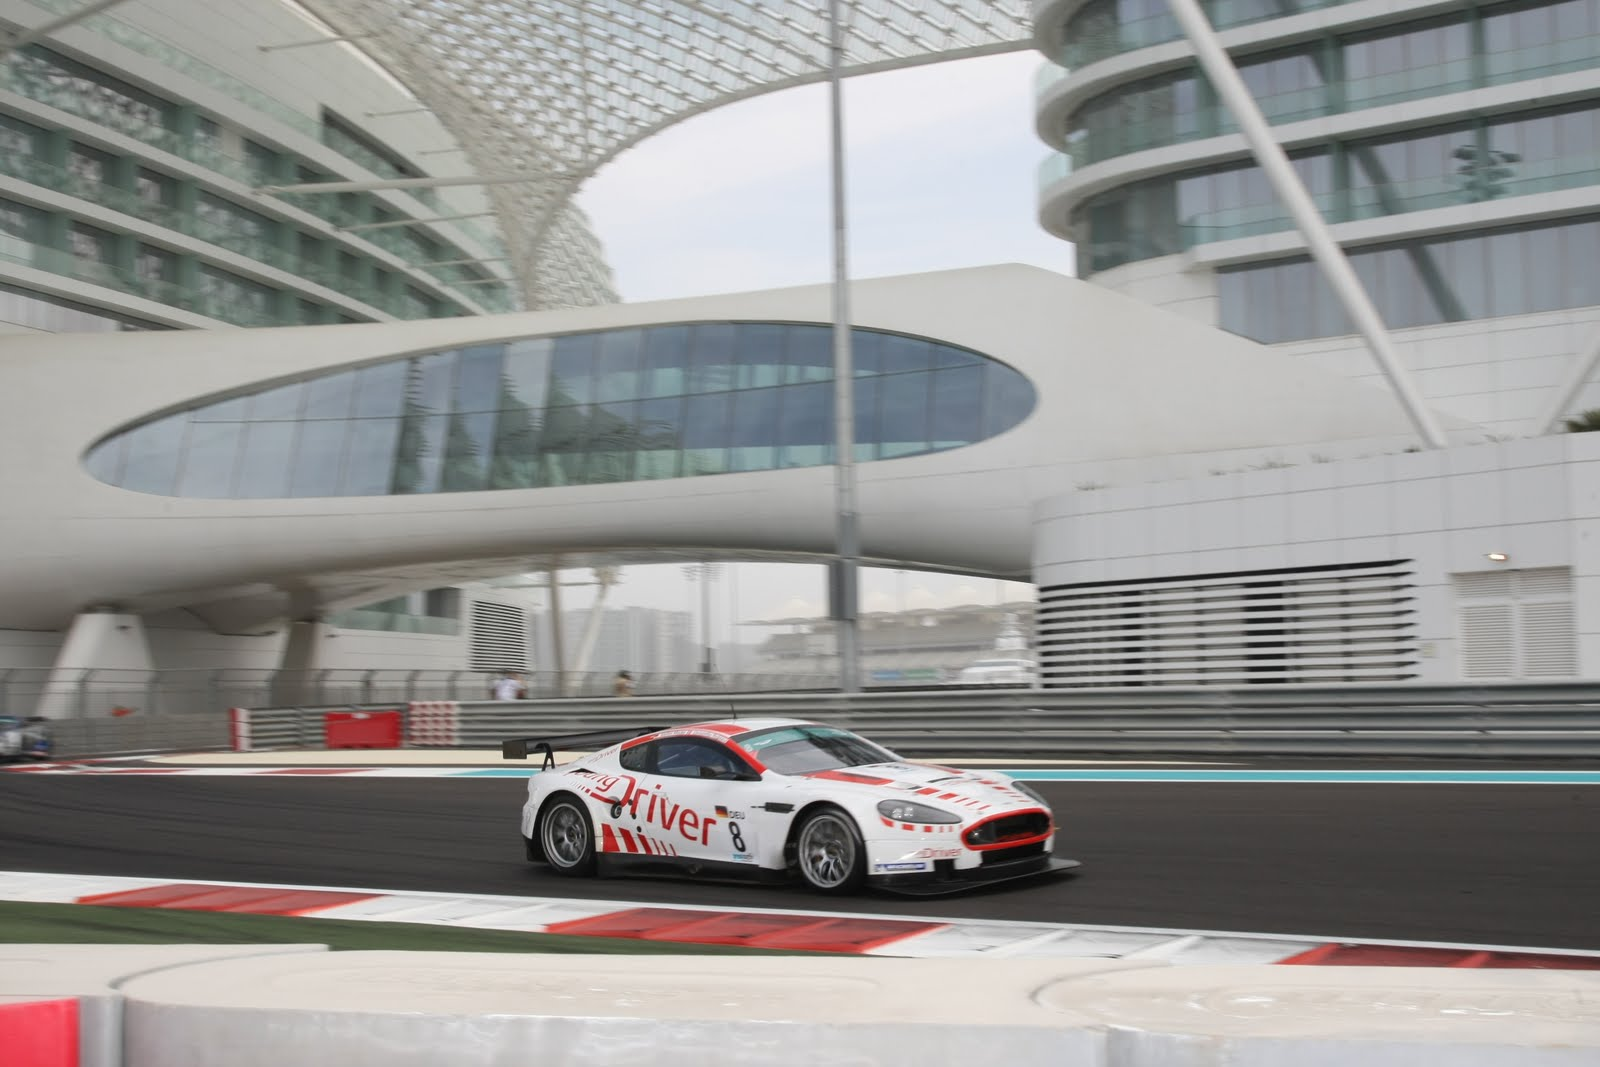 新設のFIA GT1 世界選手権 FIA GT1 ...